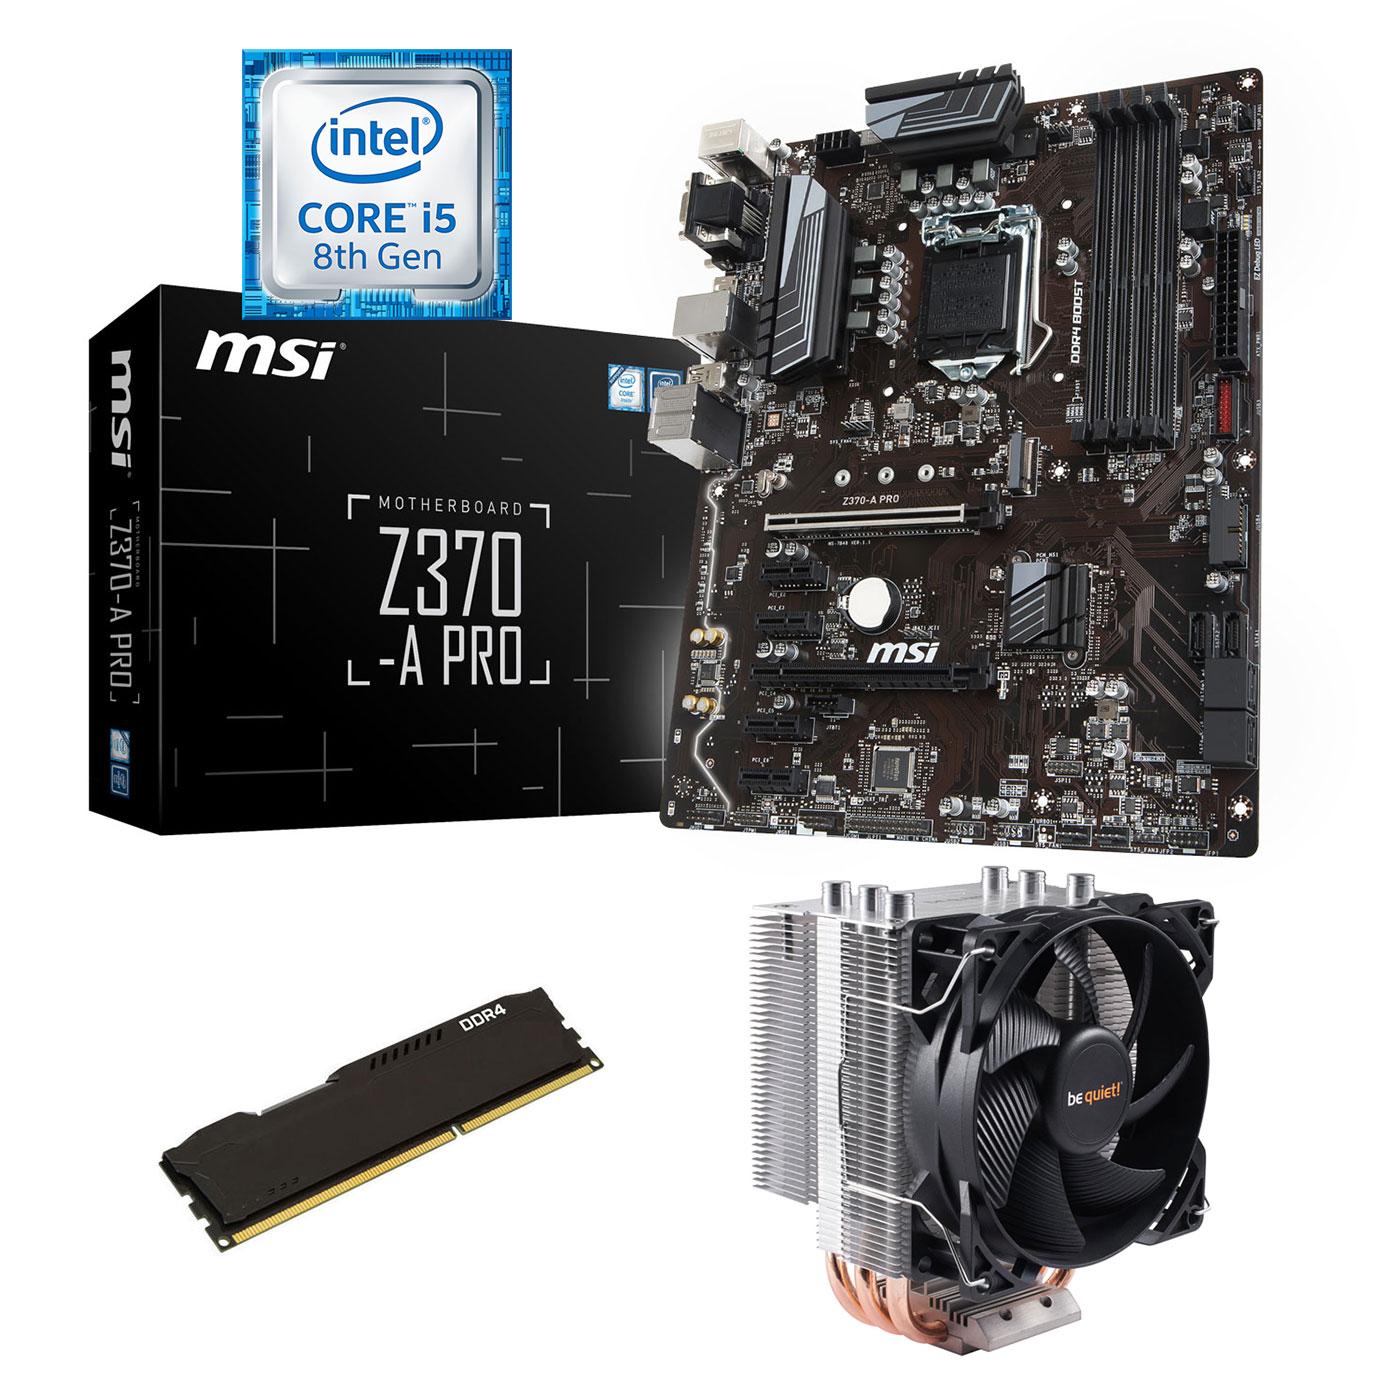 Kit upgrade PC Kit Upgrade PC Core i5 MSI Z370-A PRO 4 Go Carte mère Socket 1151 Intel Z370 Express + CPU Intel Core i5-8400 (2.8 GHz) + RAM 4 Go DDR4